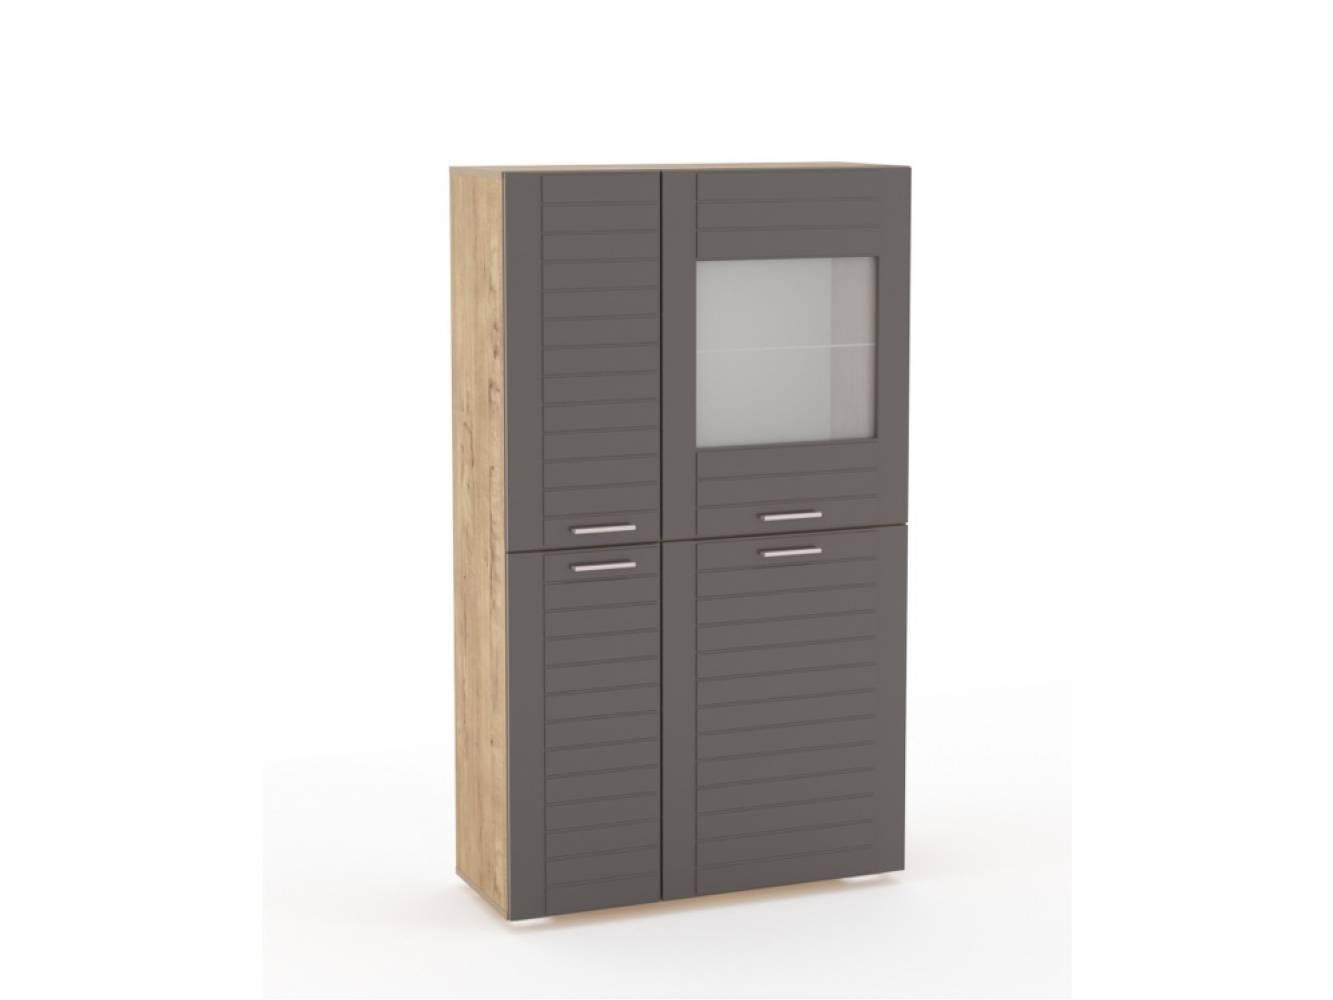 Шкаф комбинированный НМ 011.48-01 LIVORNO (Дуб Бунратти/Софт Графит)